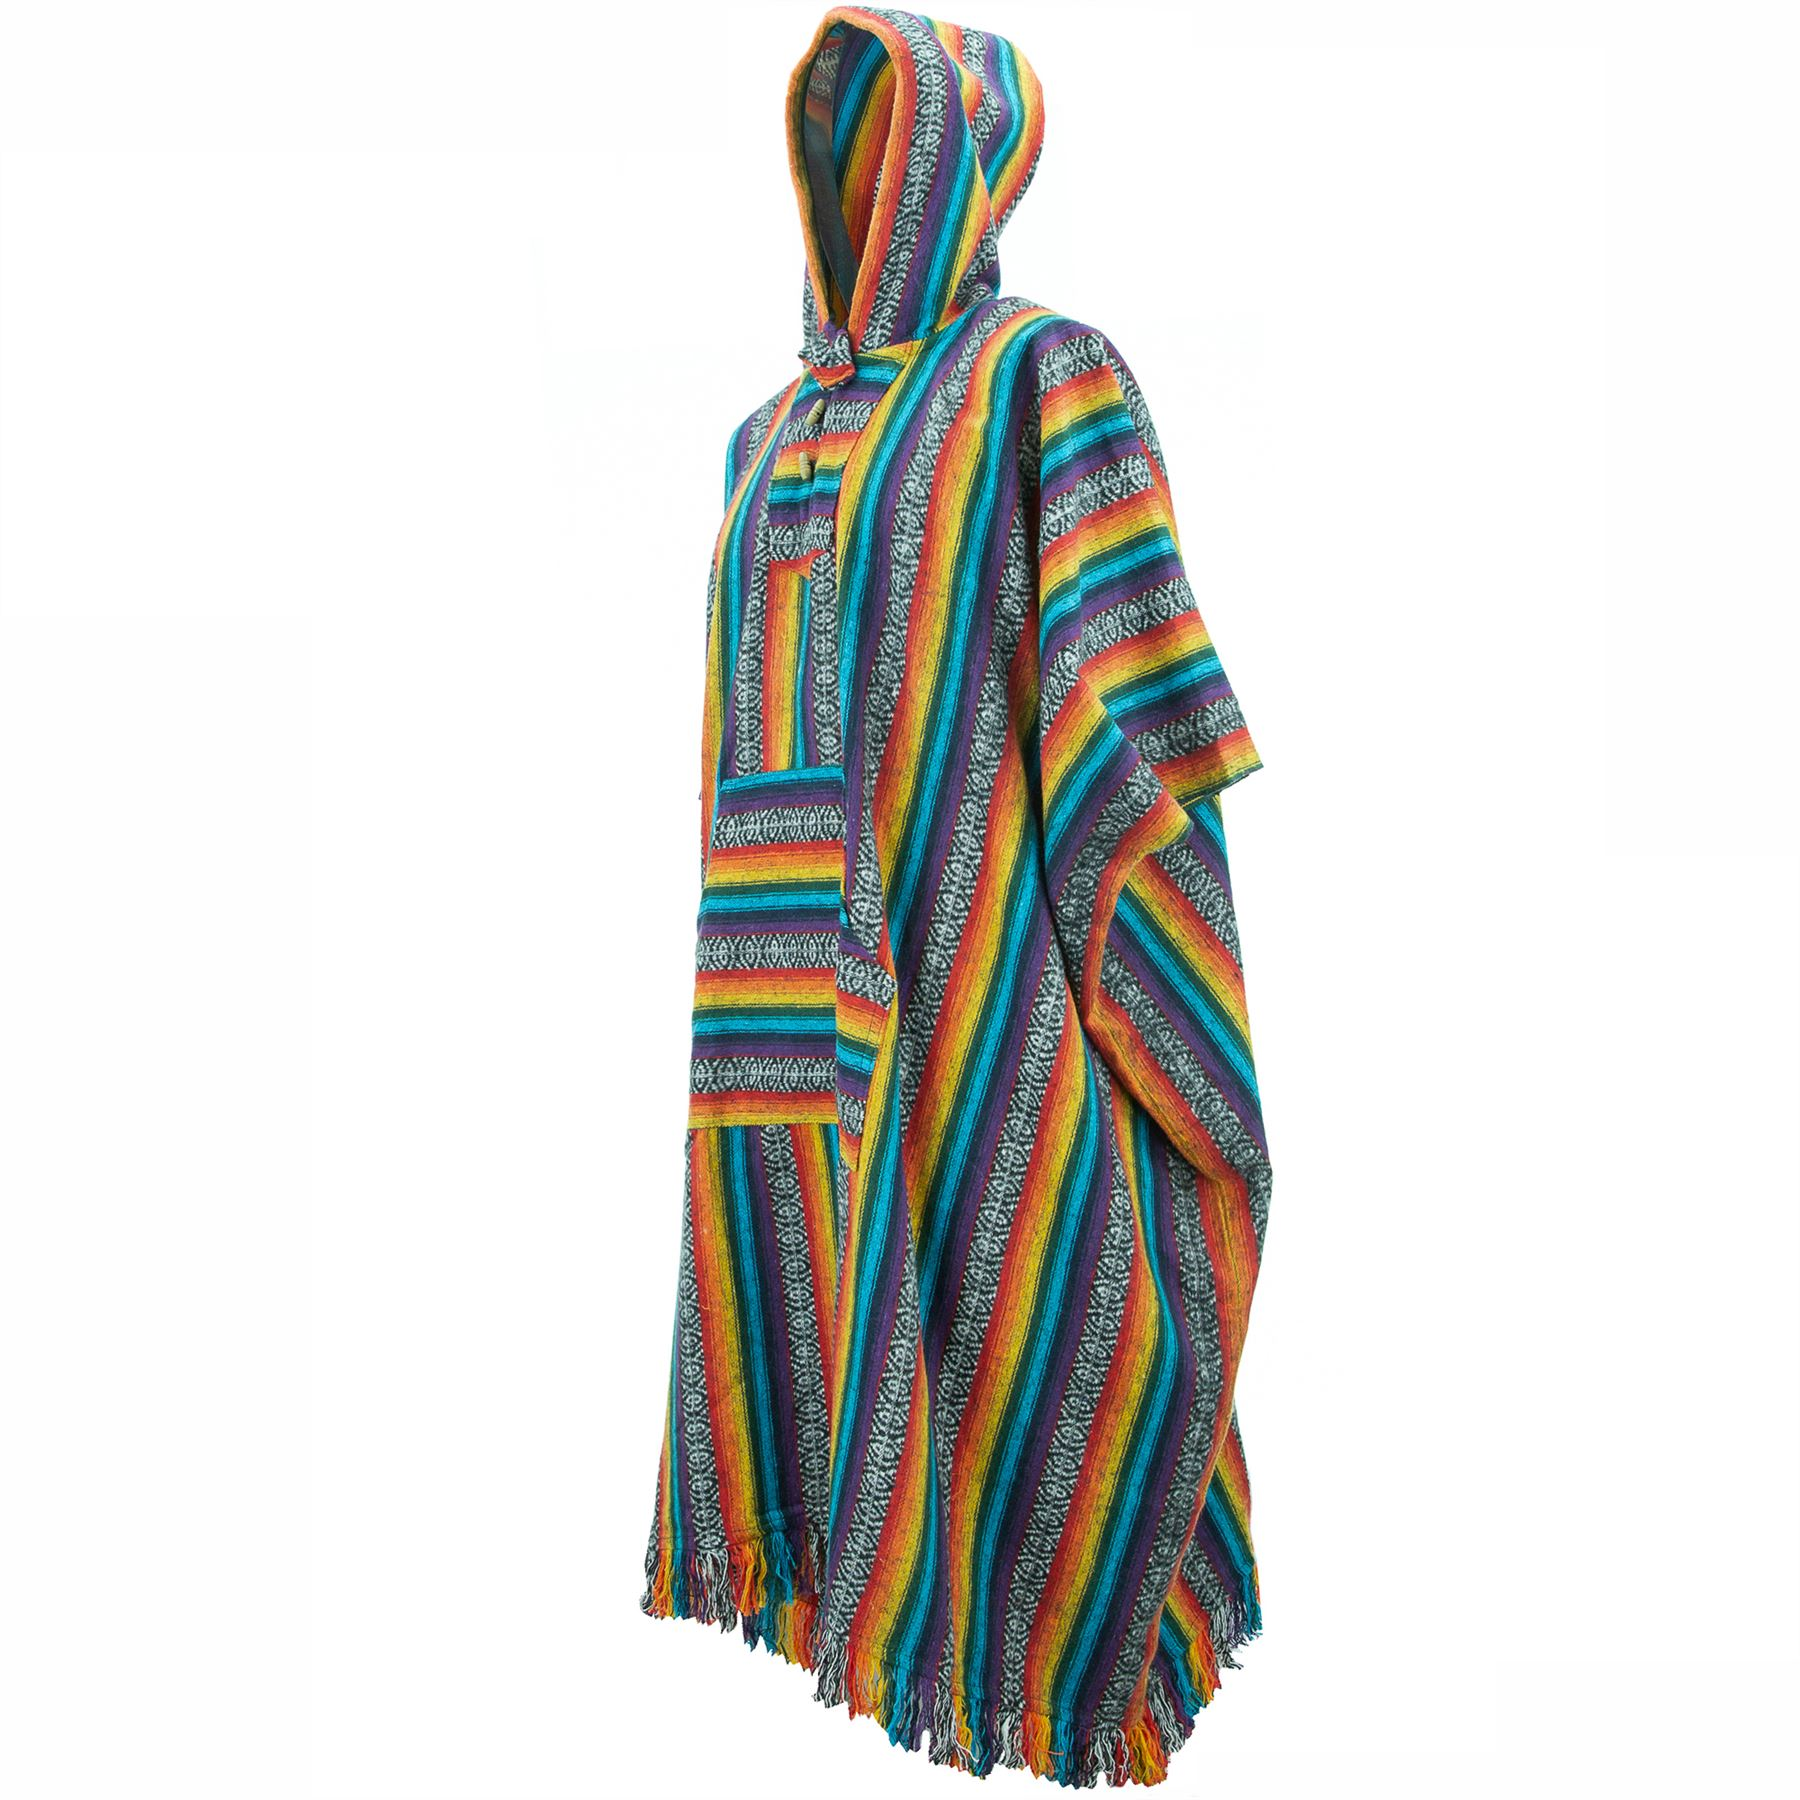 Poncho-Hooded-Cape-Cotton-Warm-Festival-Long-Woven-Rainbow-Men-Women thumbnail 16